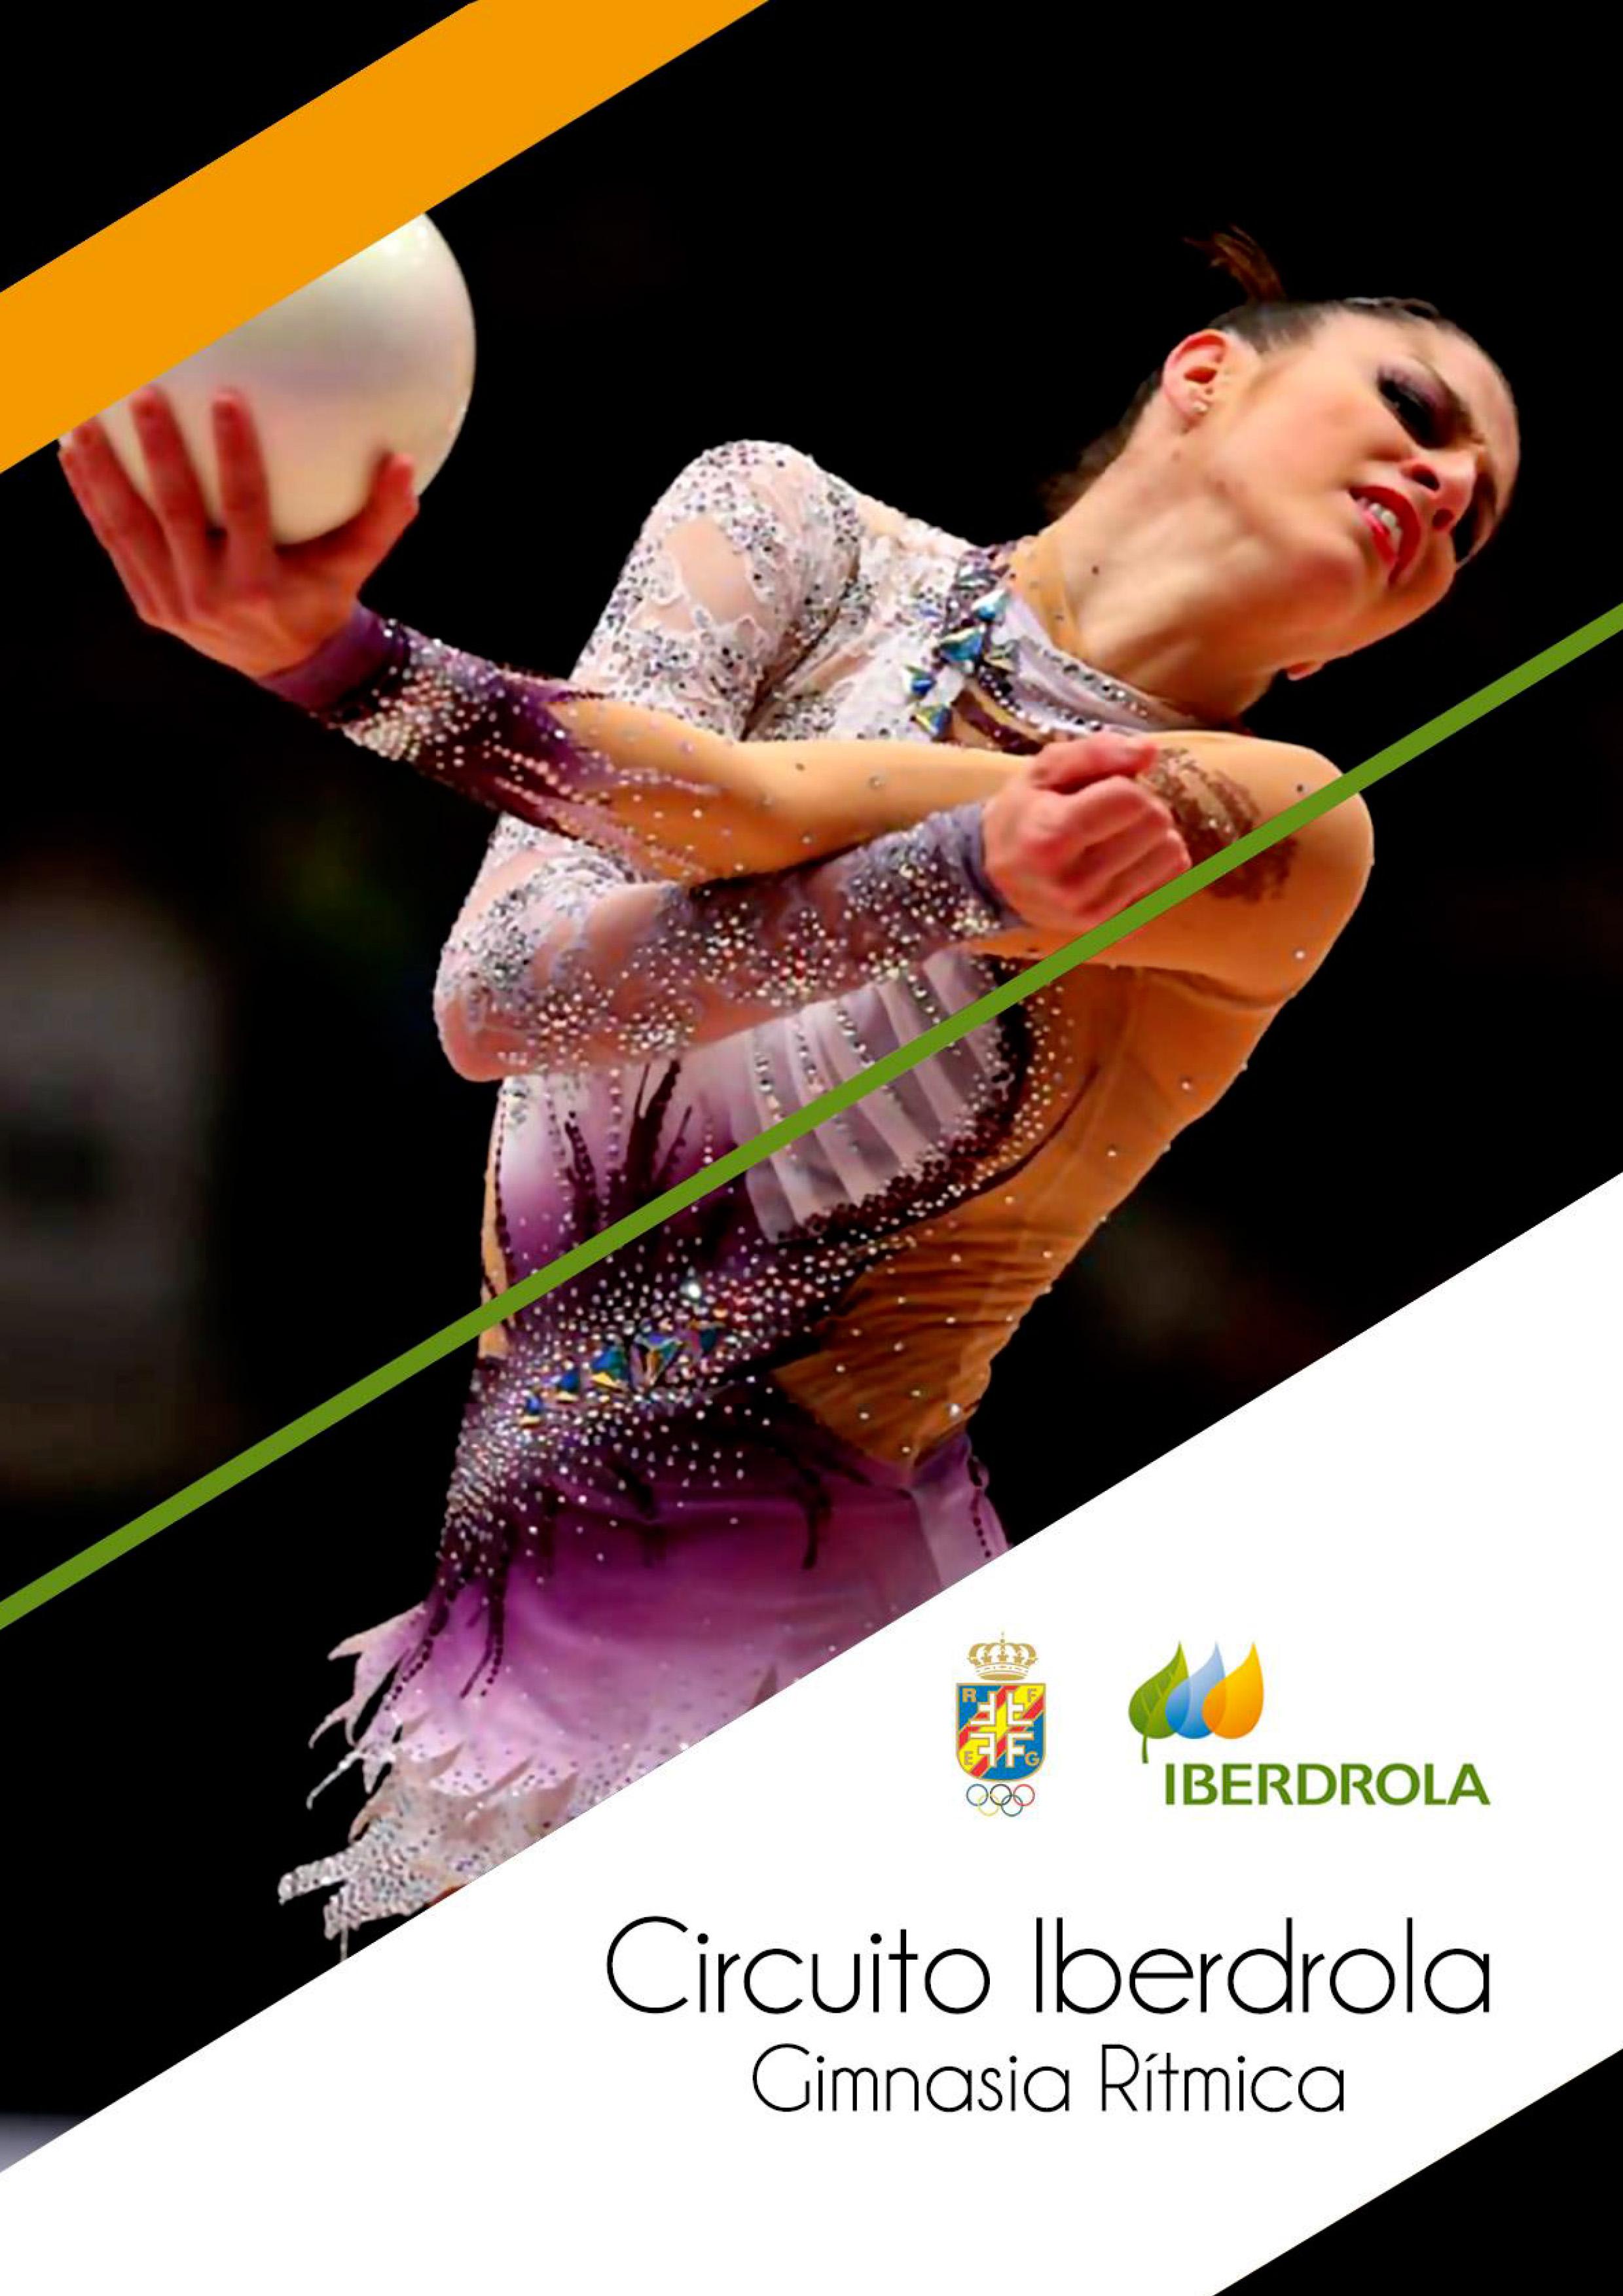 Poster circuito IBERDROLA 2017